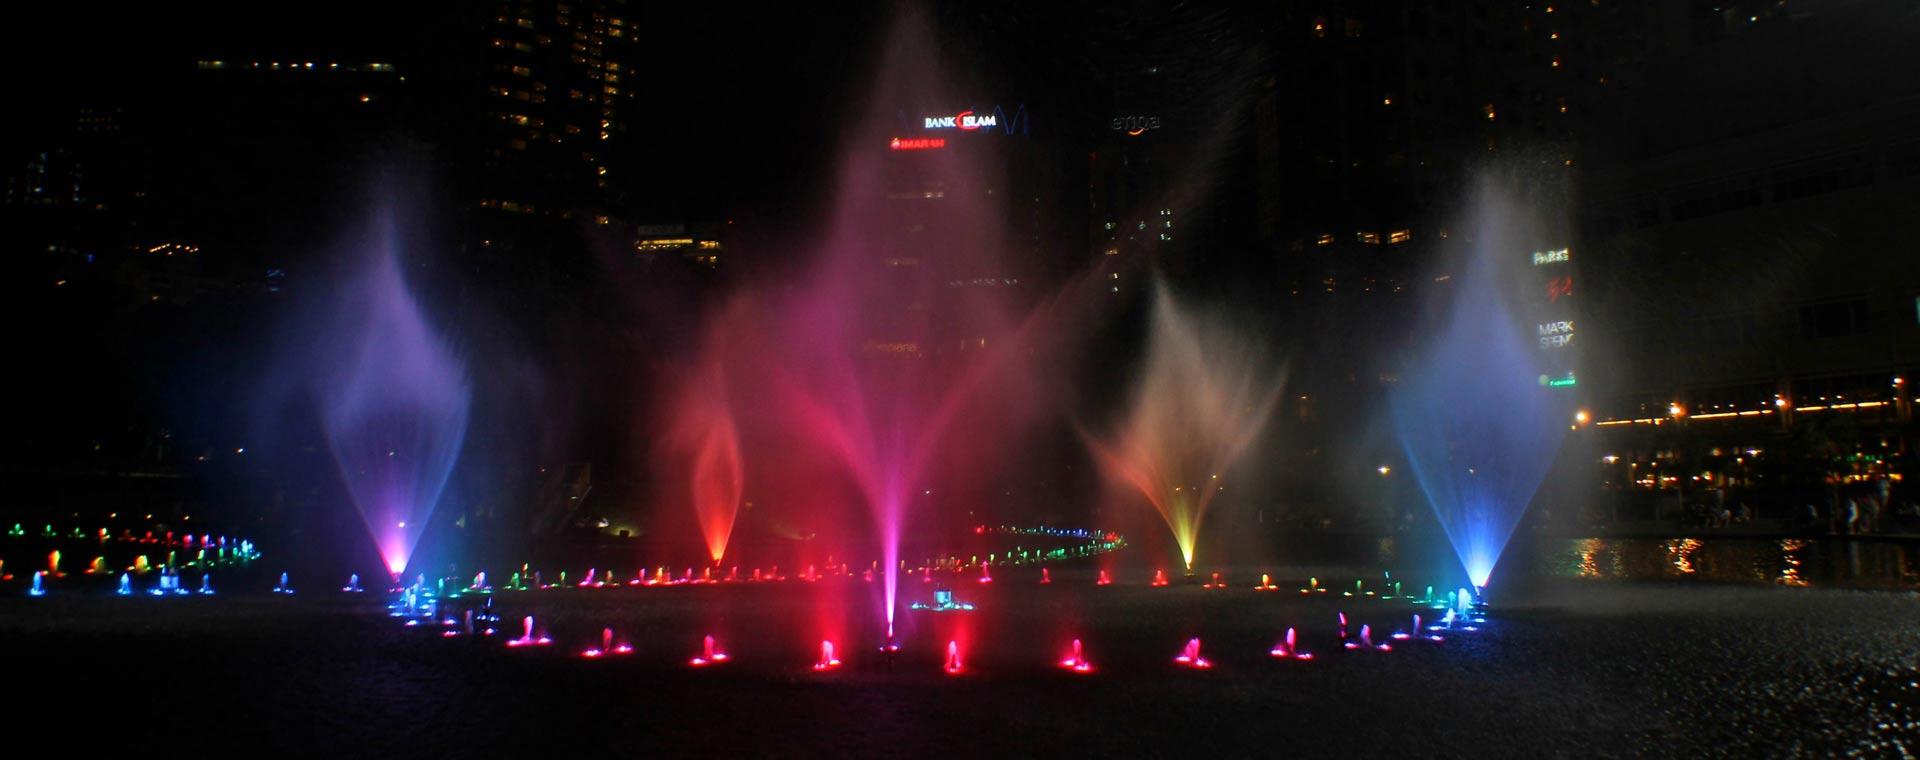 噴泉003